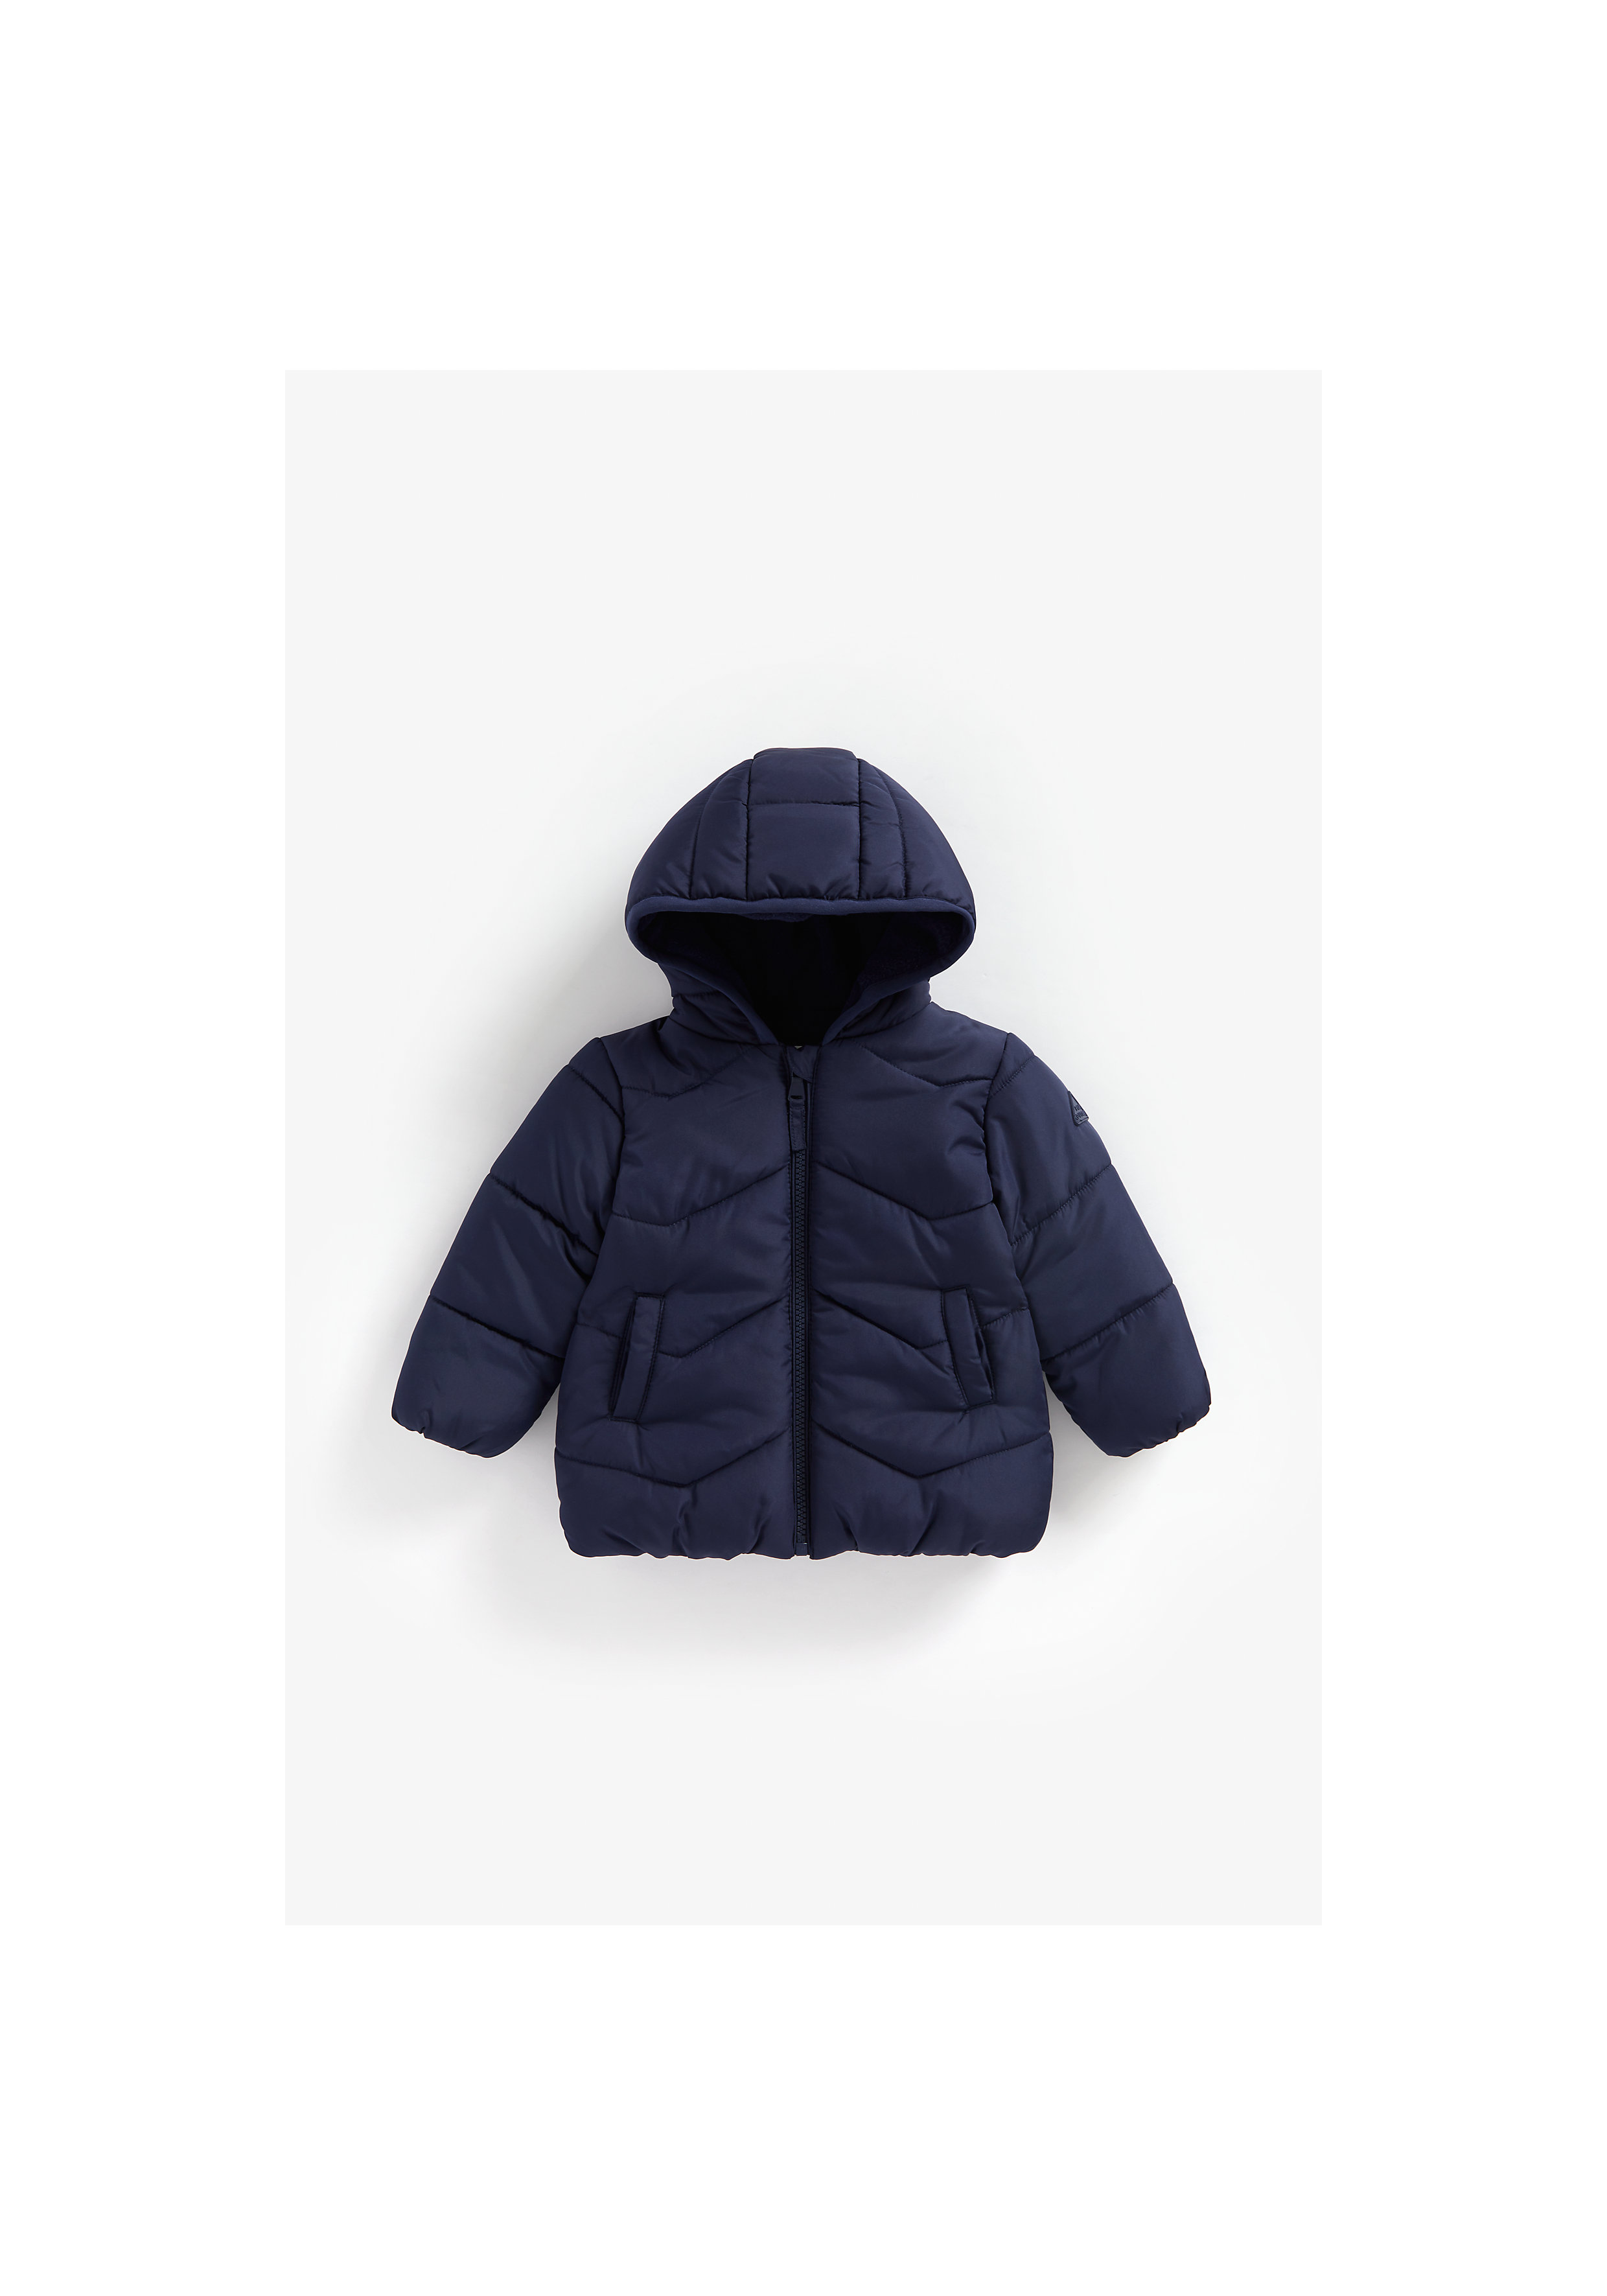 Mothercare | Boys Full Sleeves Hooded Jacket Fleece Lined - Navy